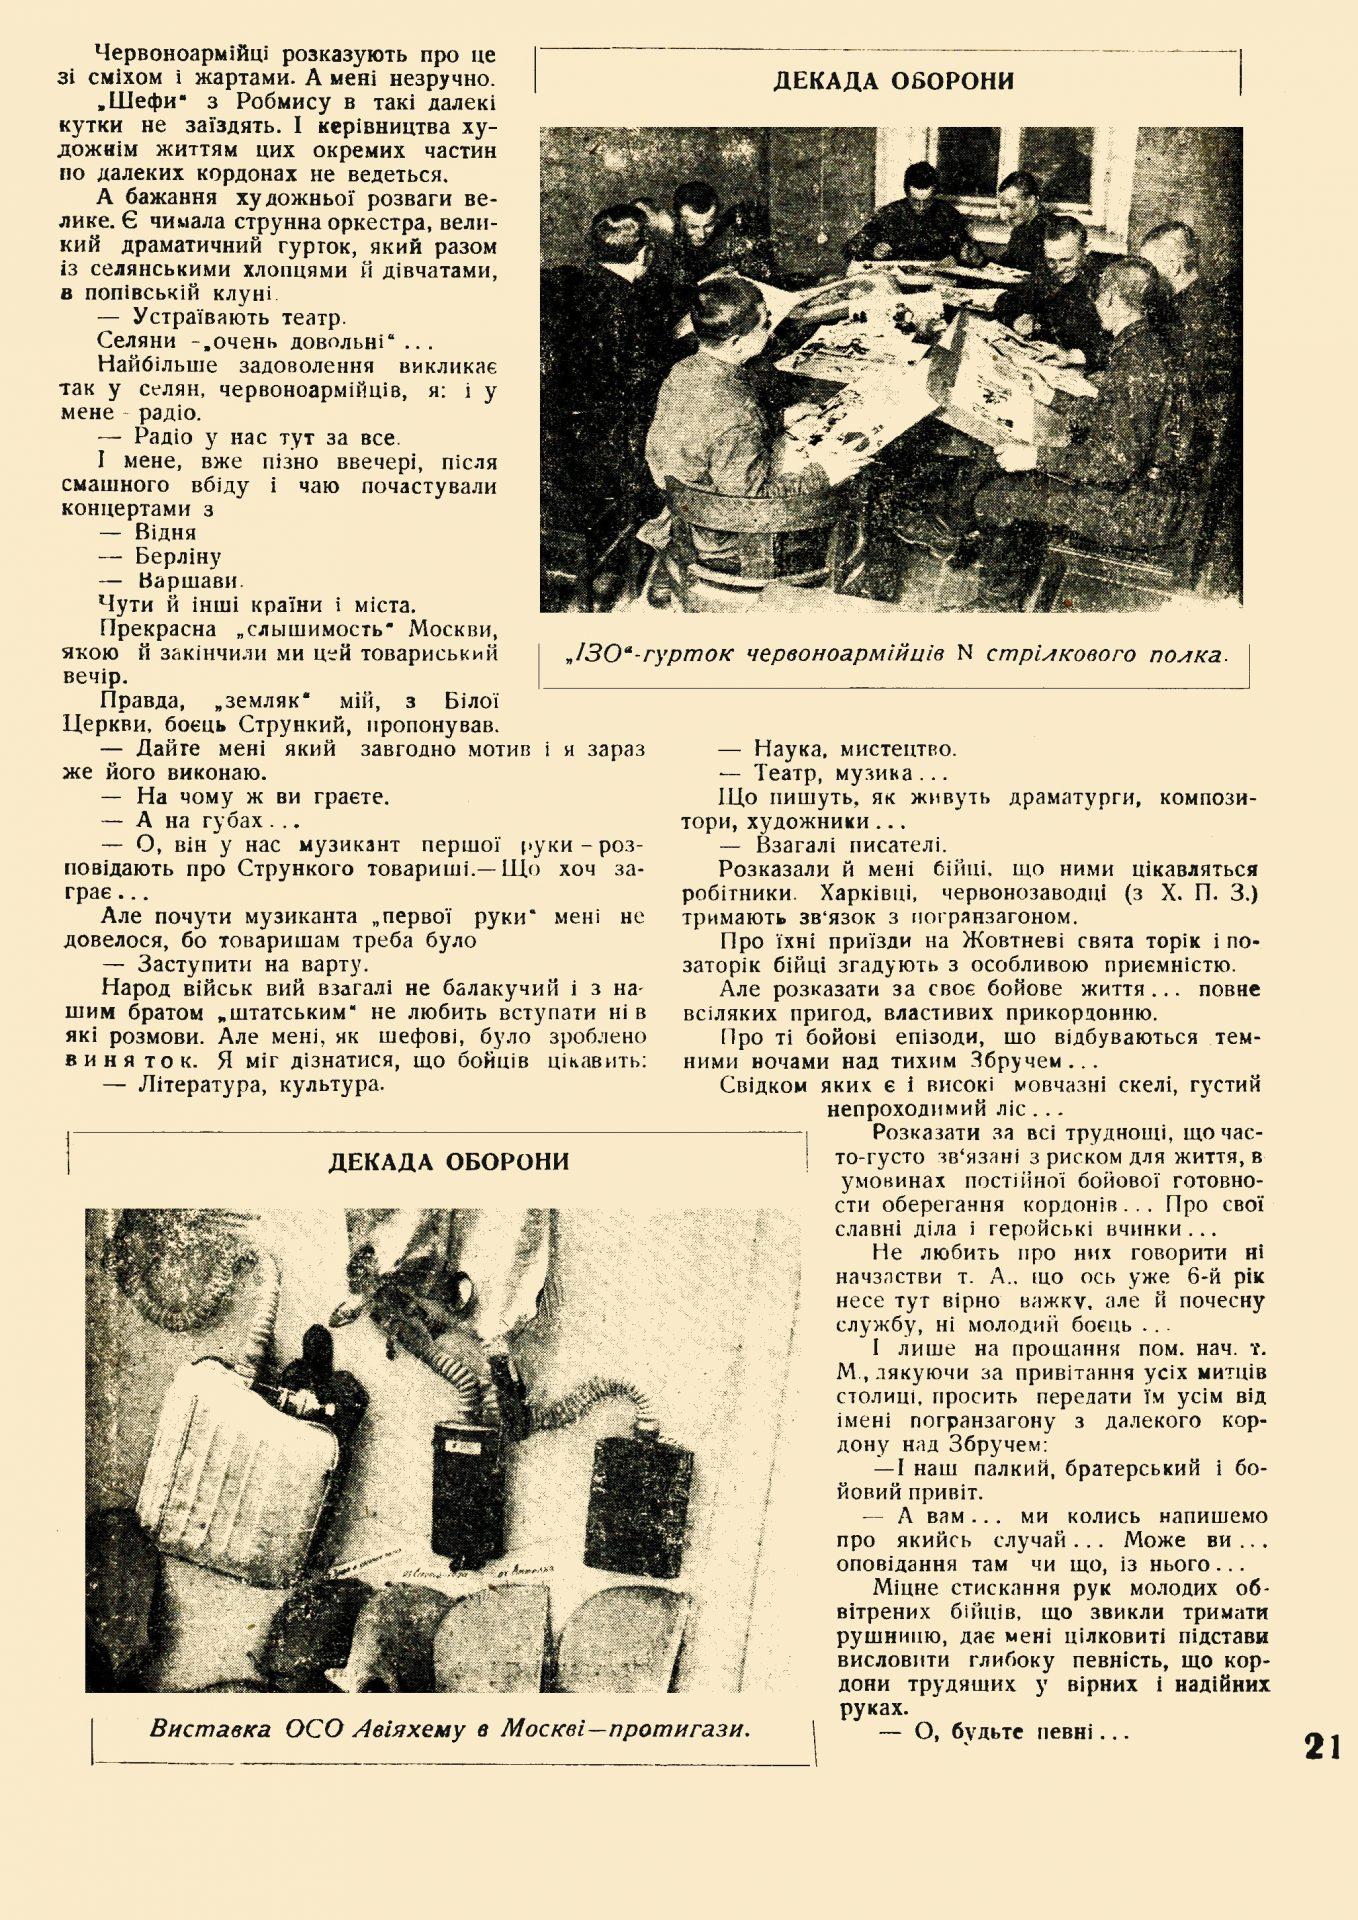 Мистецька трибуна_1930_№ 18-19